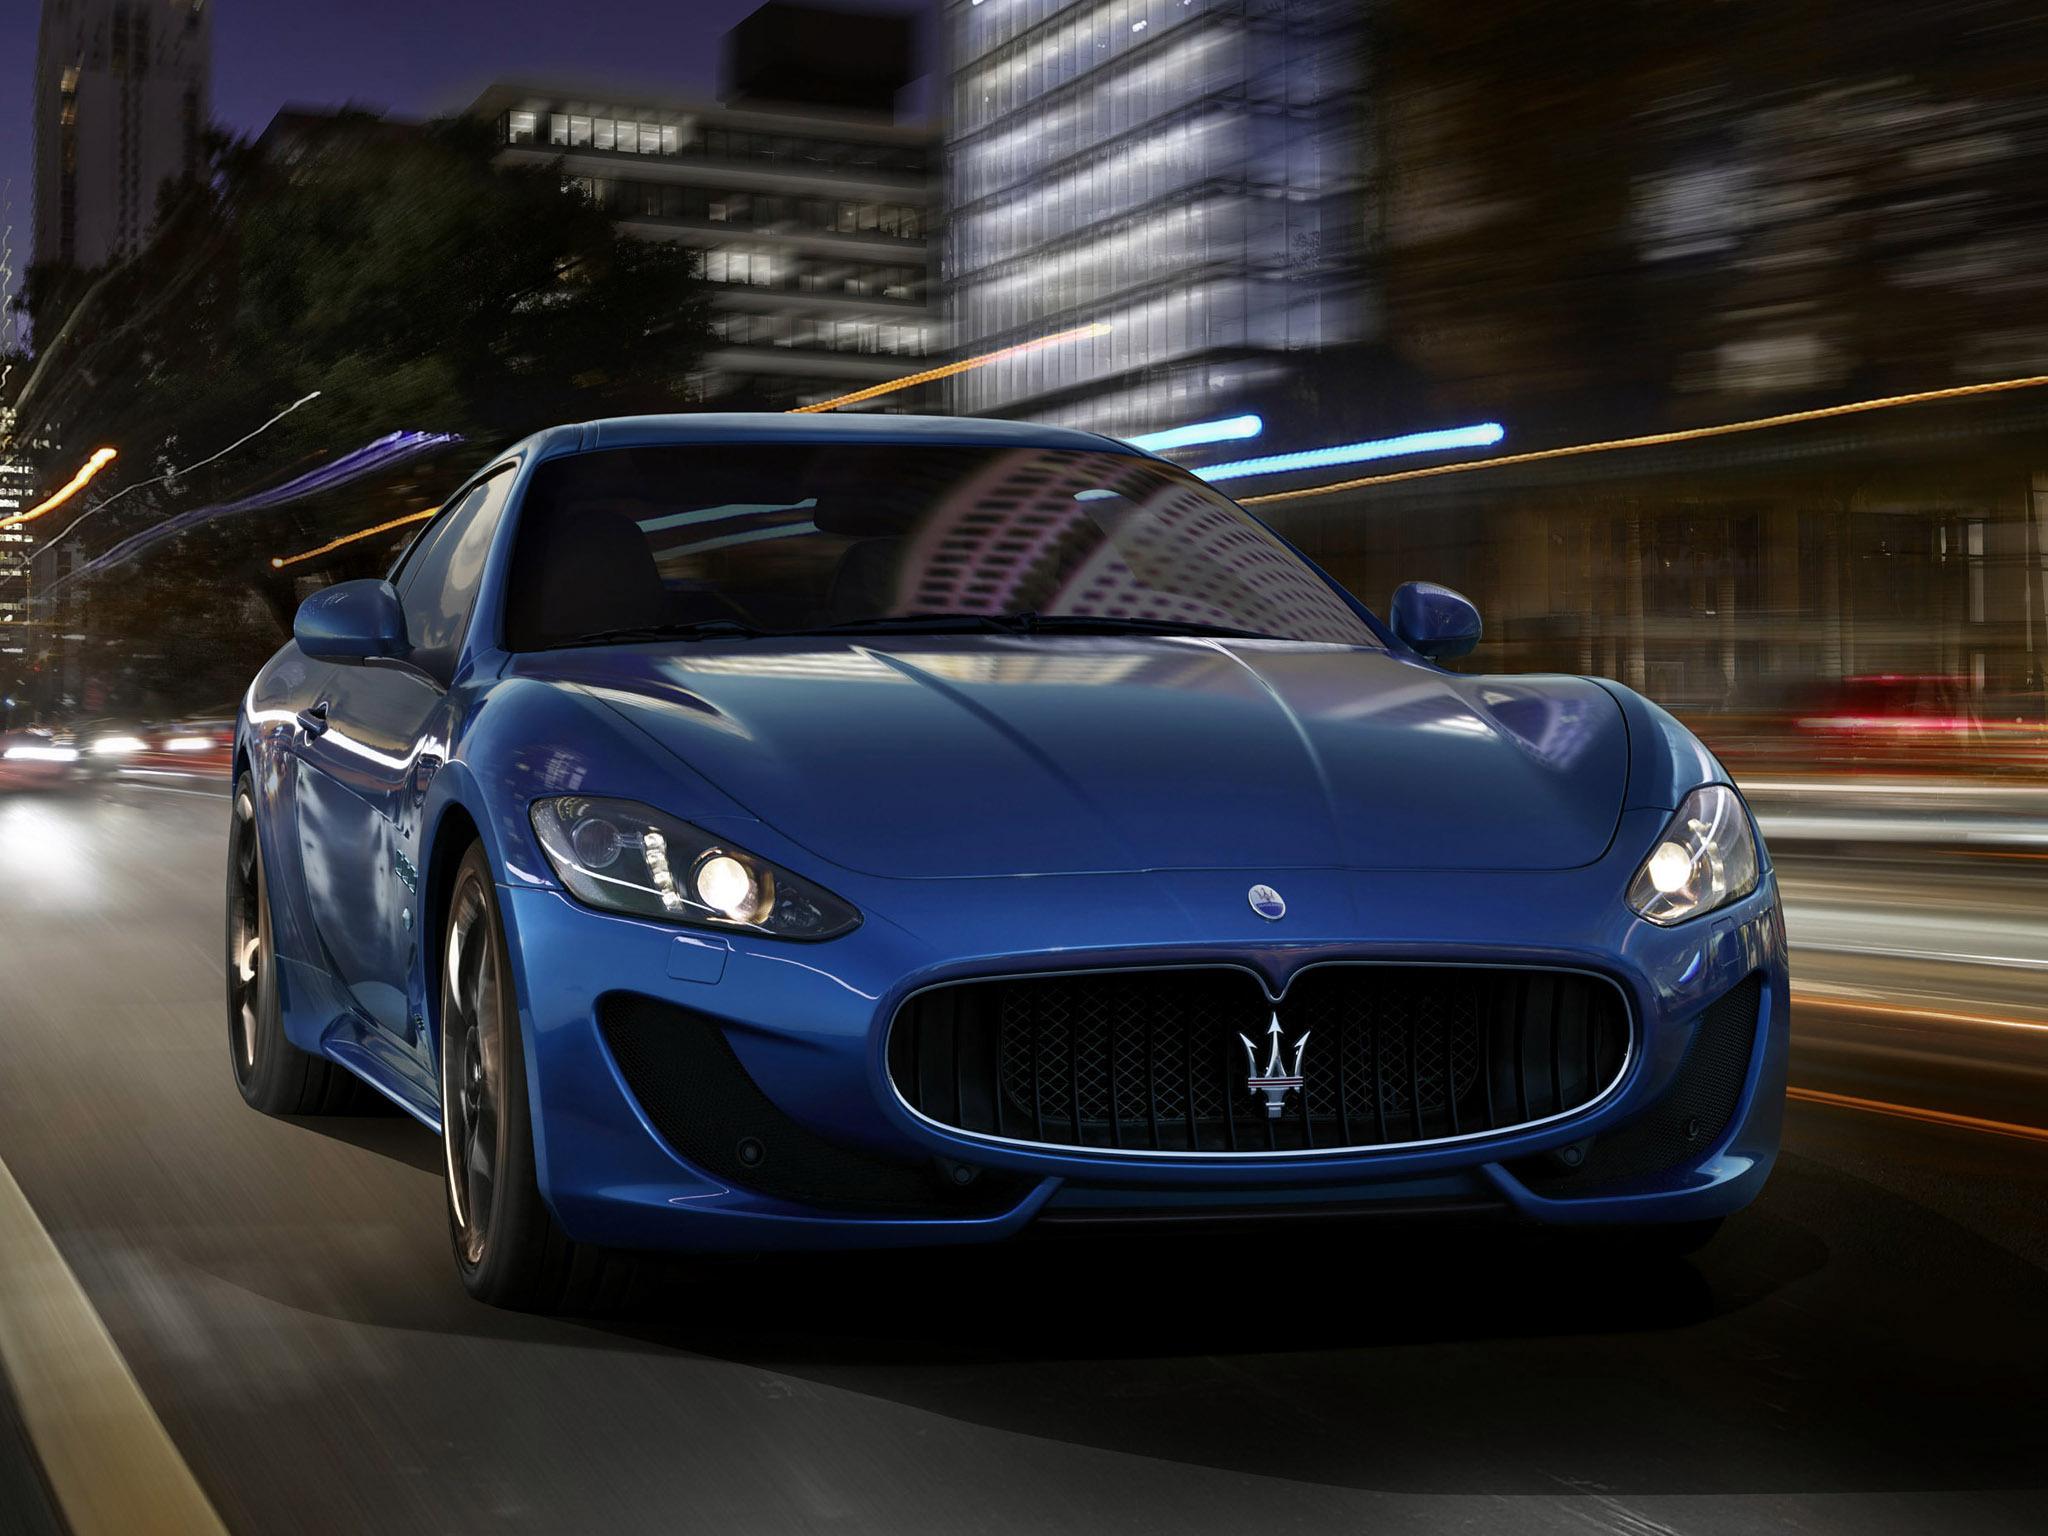 Gta V Iphone 5 Wallpaper Maserati Granturismo Full Hd Wallpaper And Background